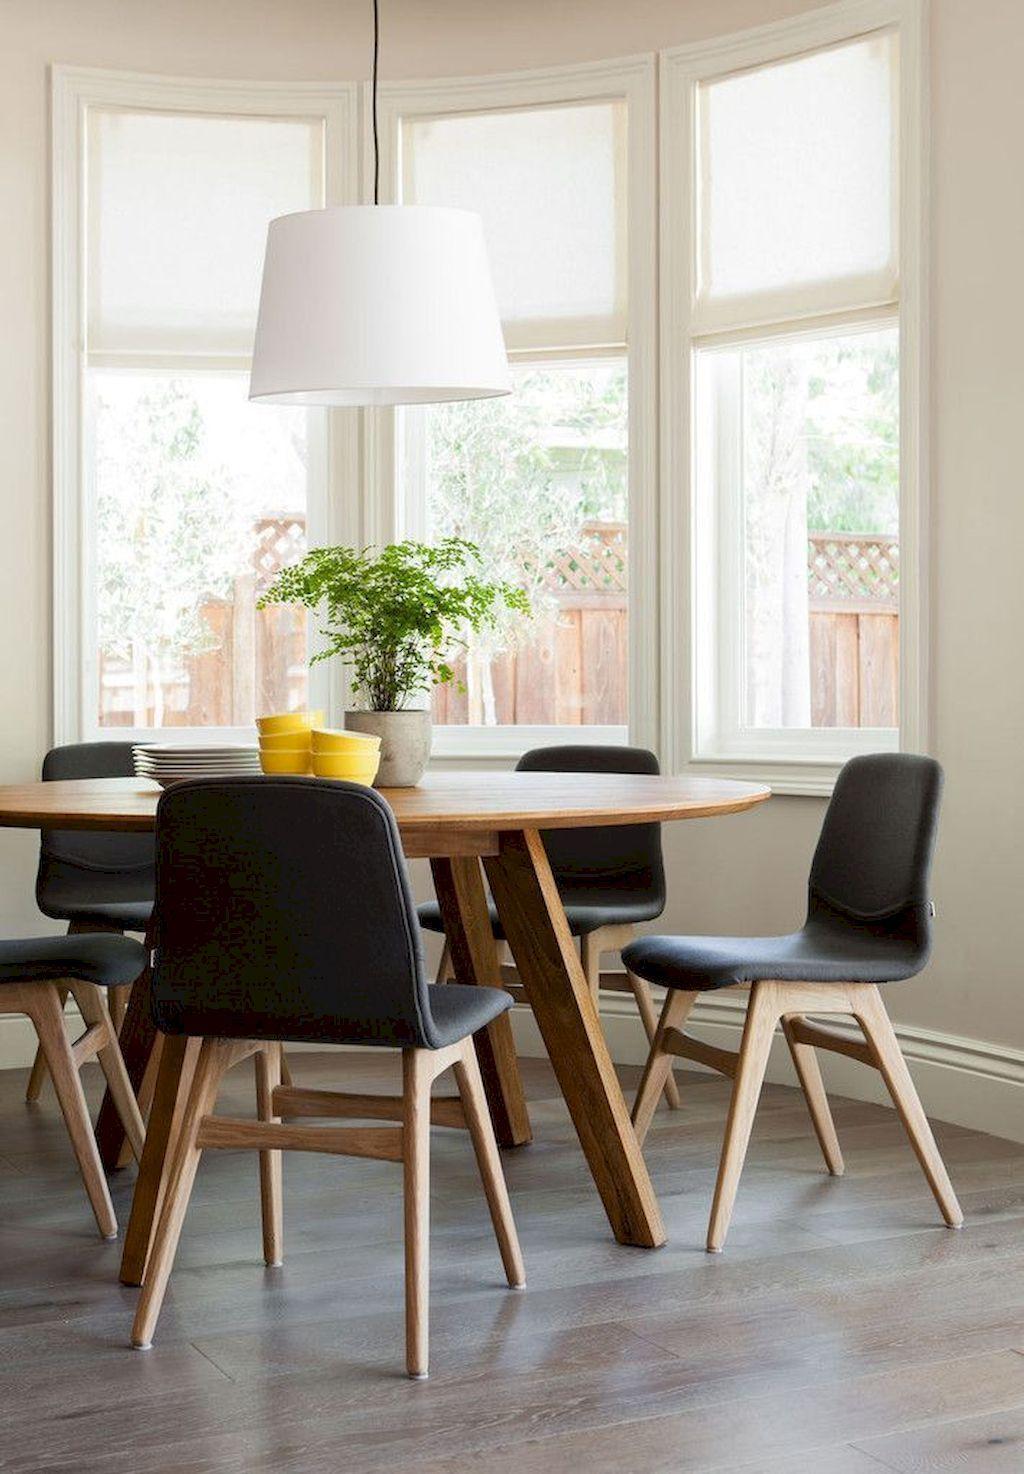 75 rustic farmhouse dining room table ideas mid century